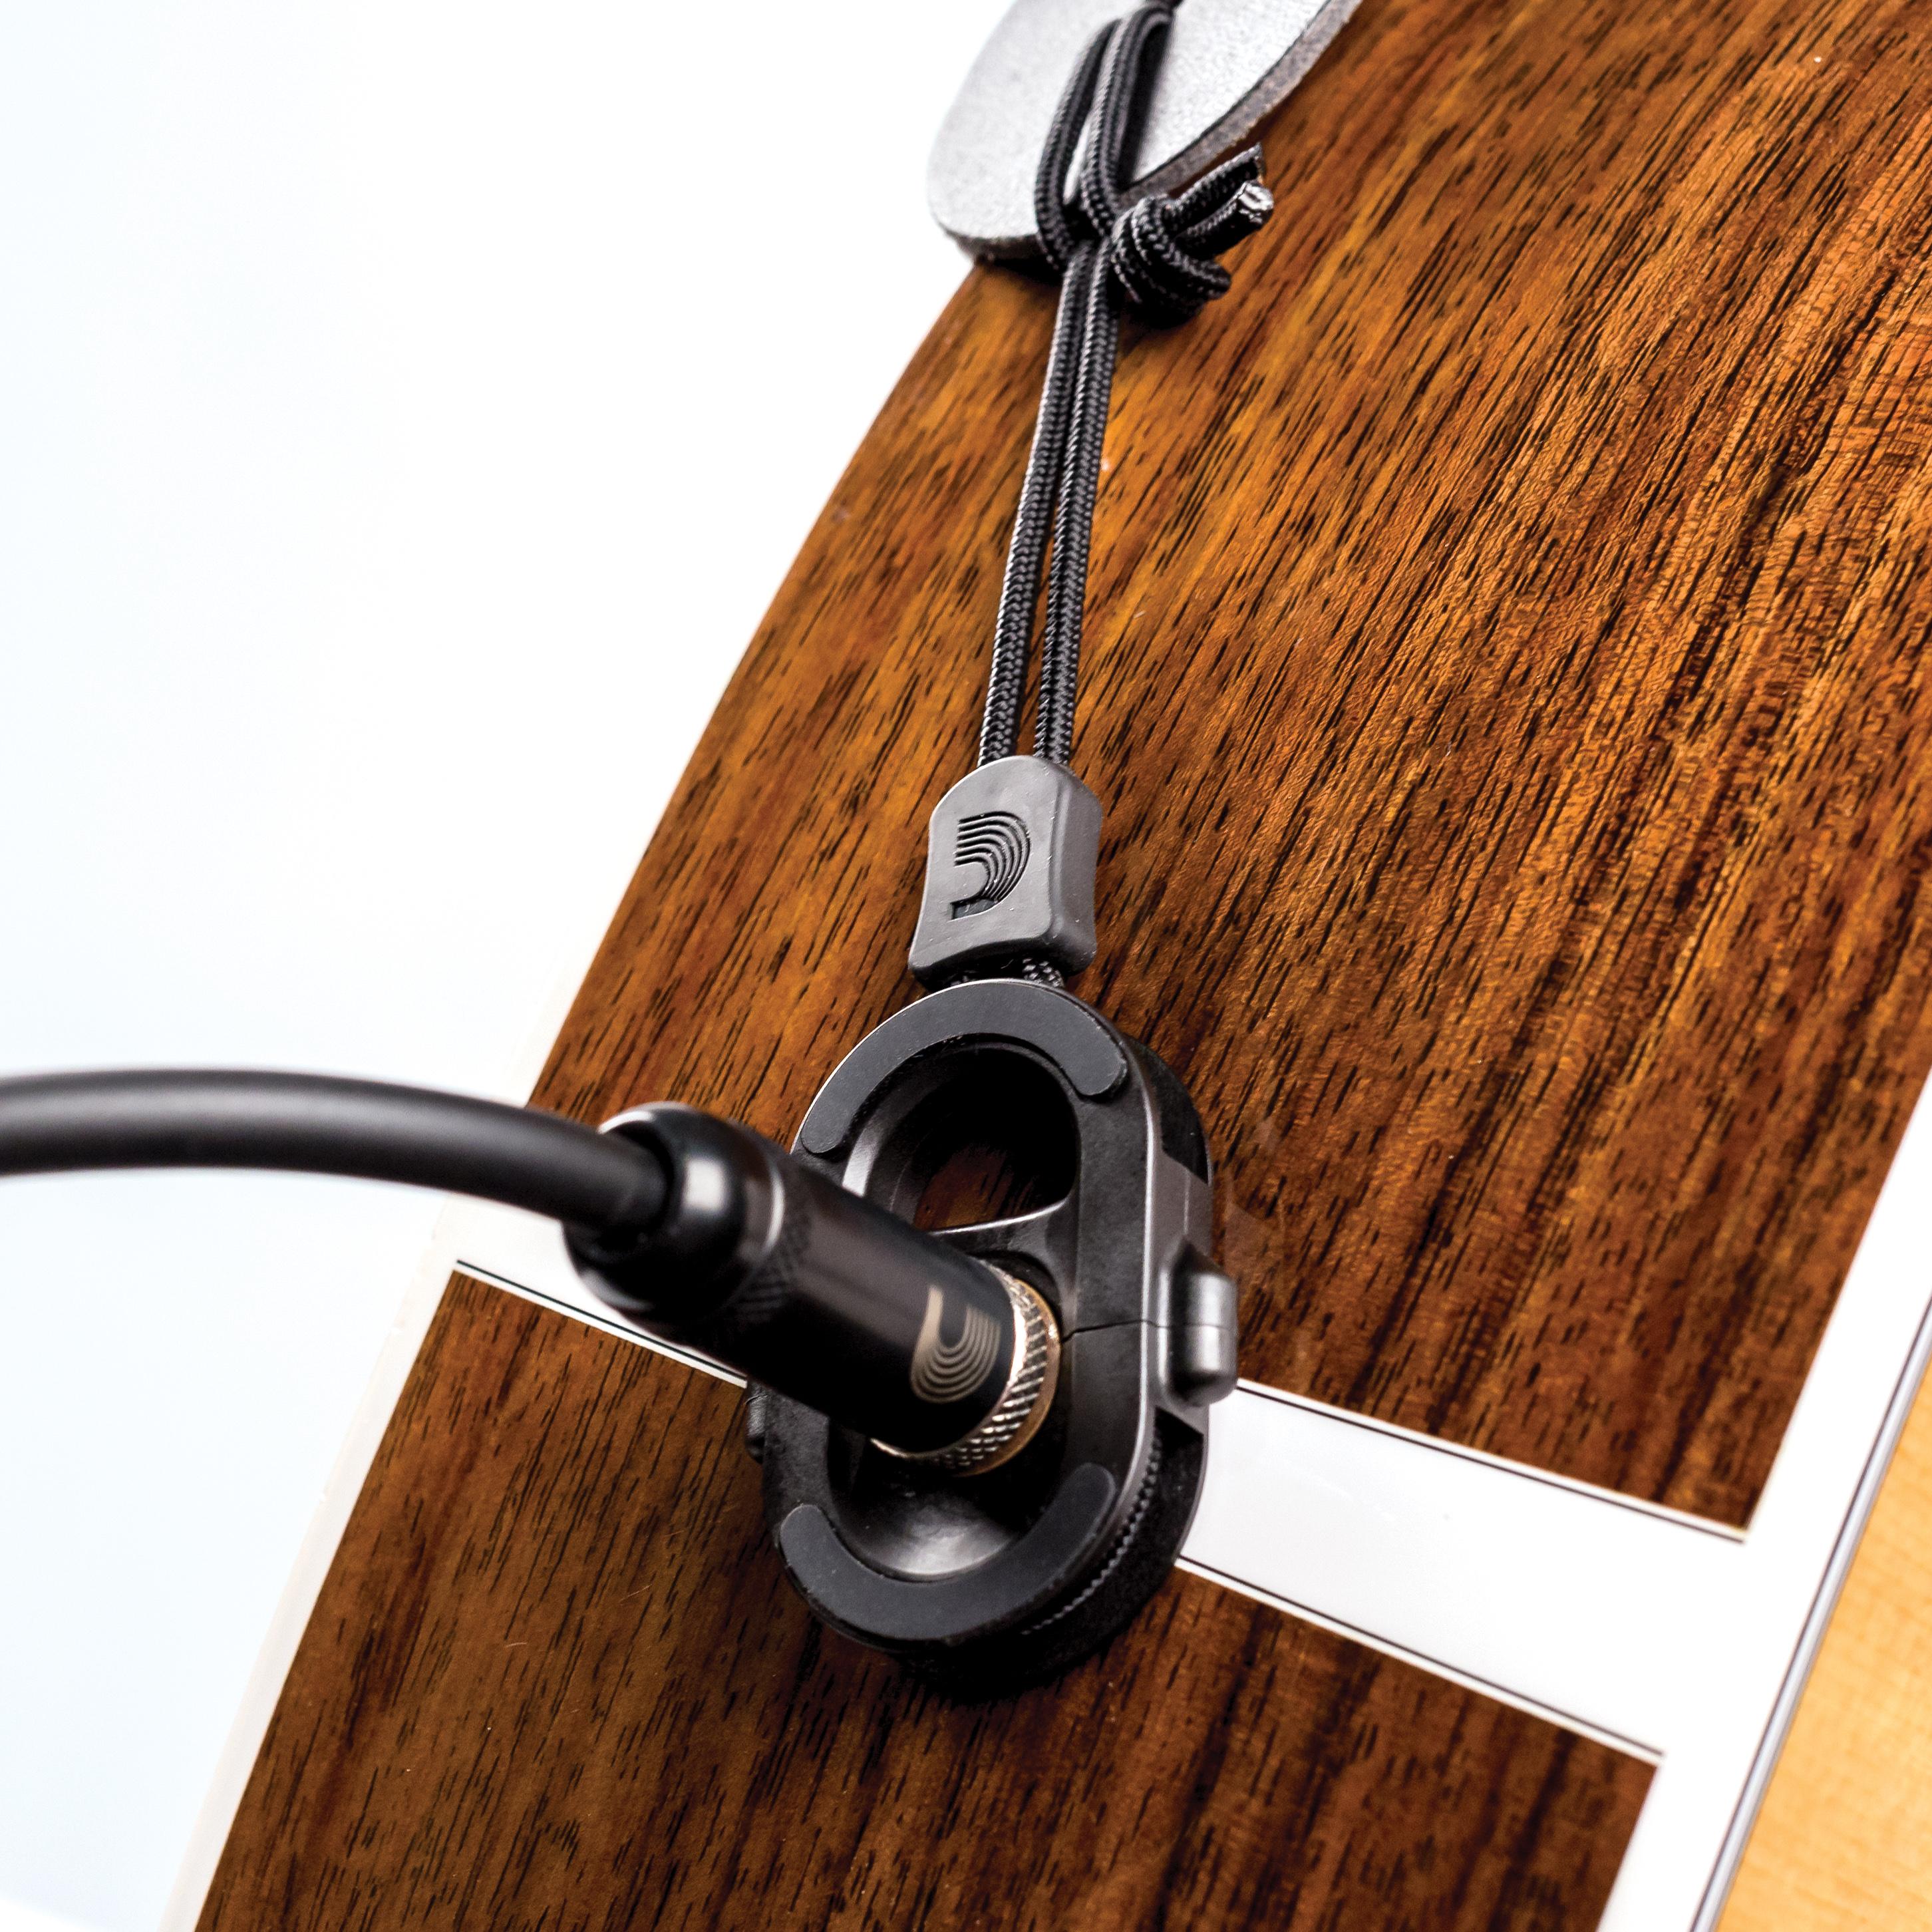 D'Addario Cinchfit Acoustic Jack Lock PW-AJL-01